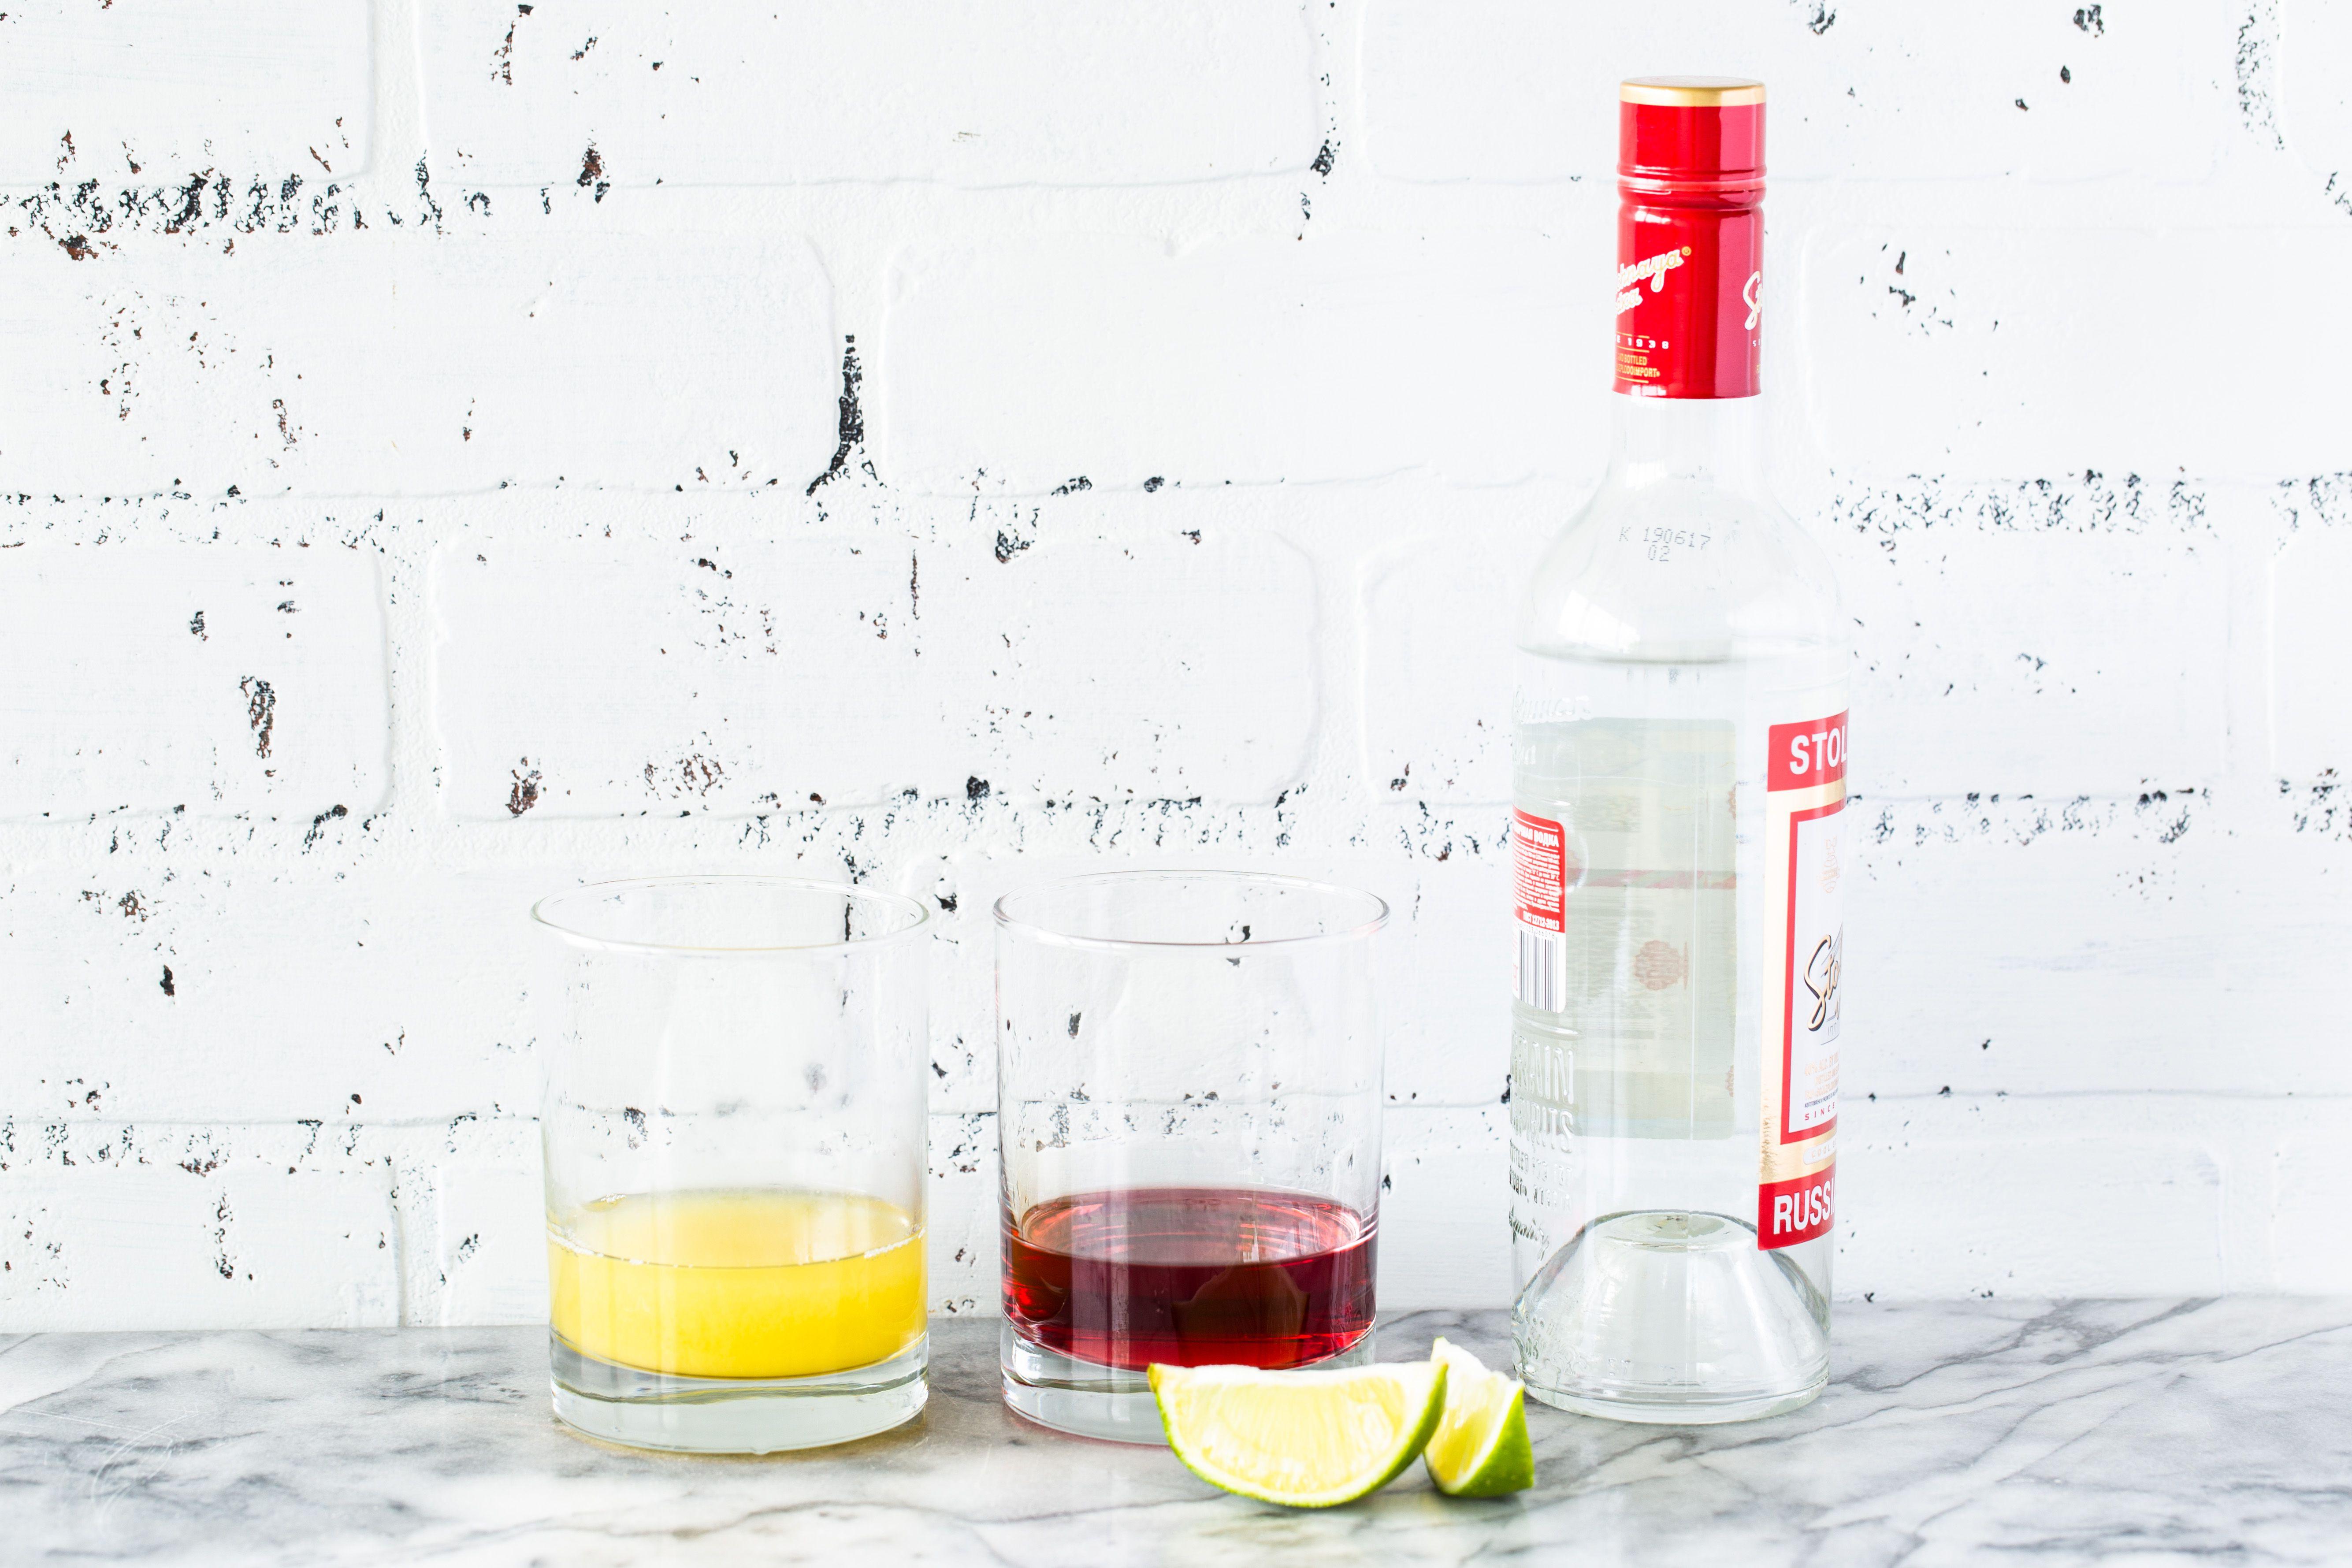 Bay breeze cocktail ingredients